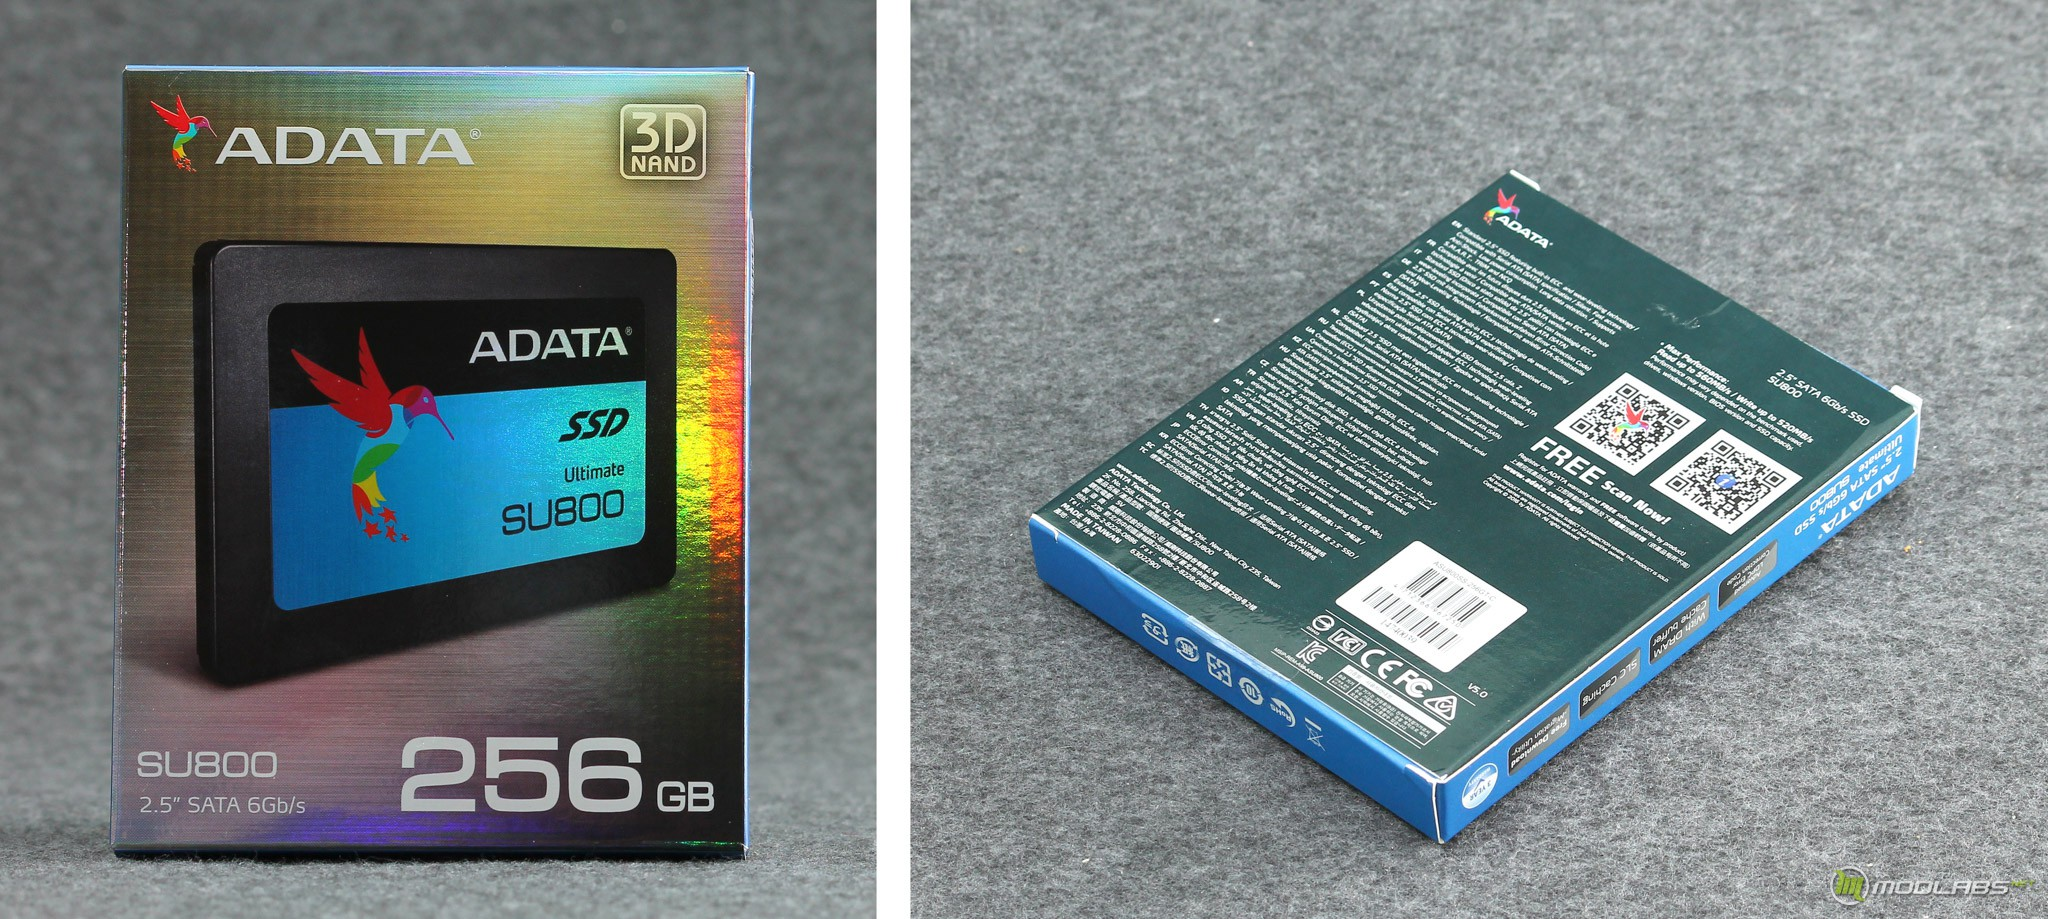 Ssd Adata Ultimate Su800 3d Nand 256gb Solid State Drive 256 Gb